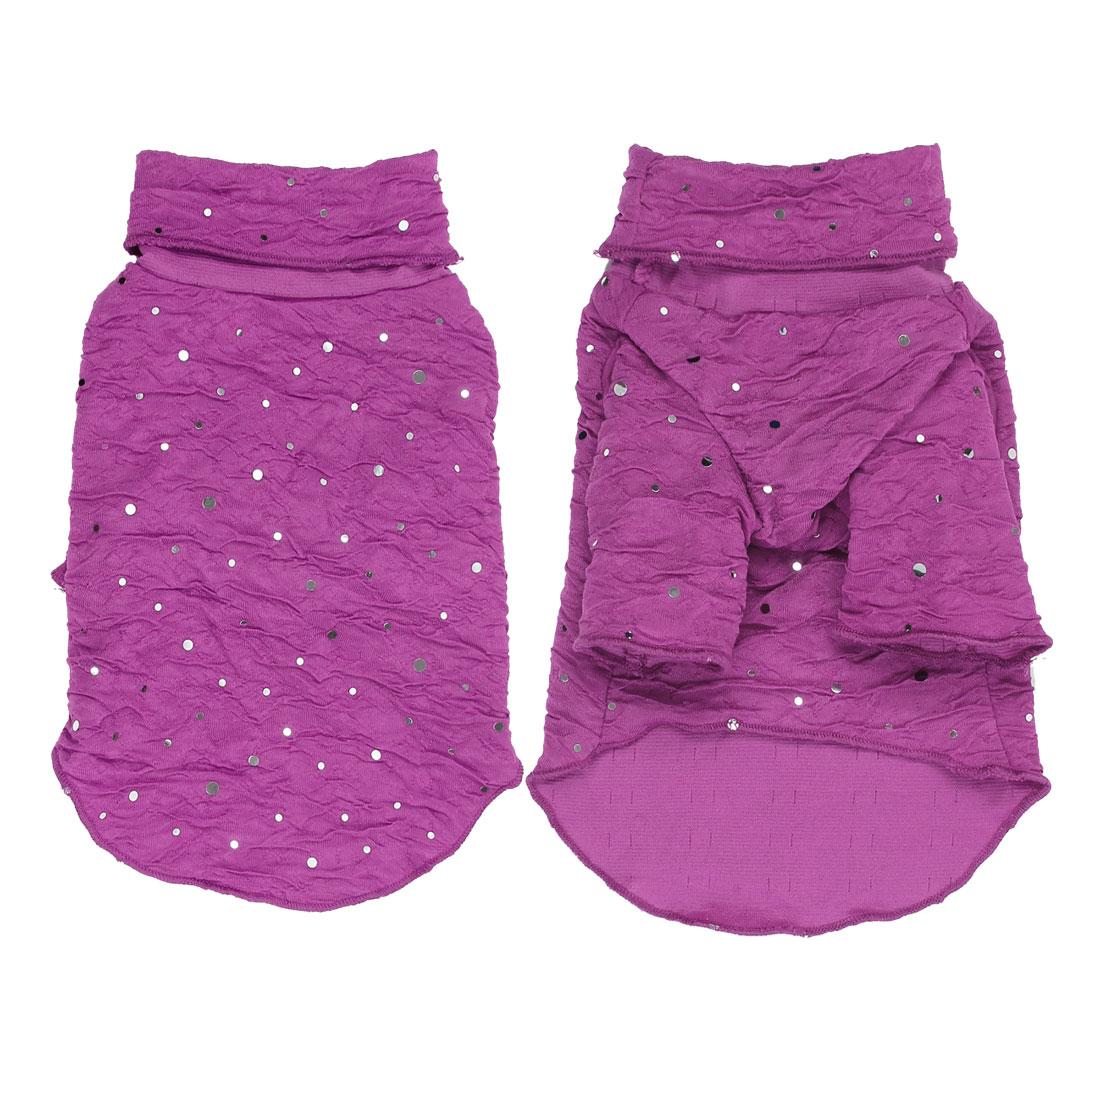 Pet Dog Puppy Turtleneck Sequins Clothes Clothing Apparel Costume Purple Size XS